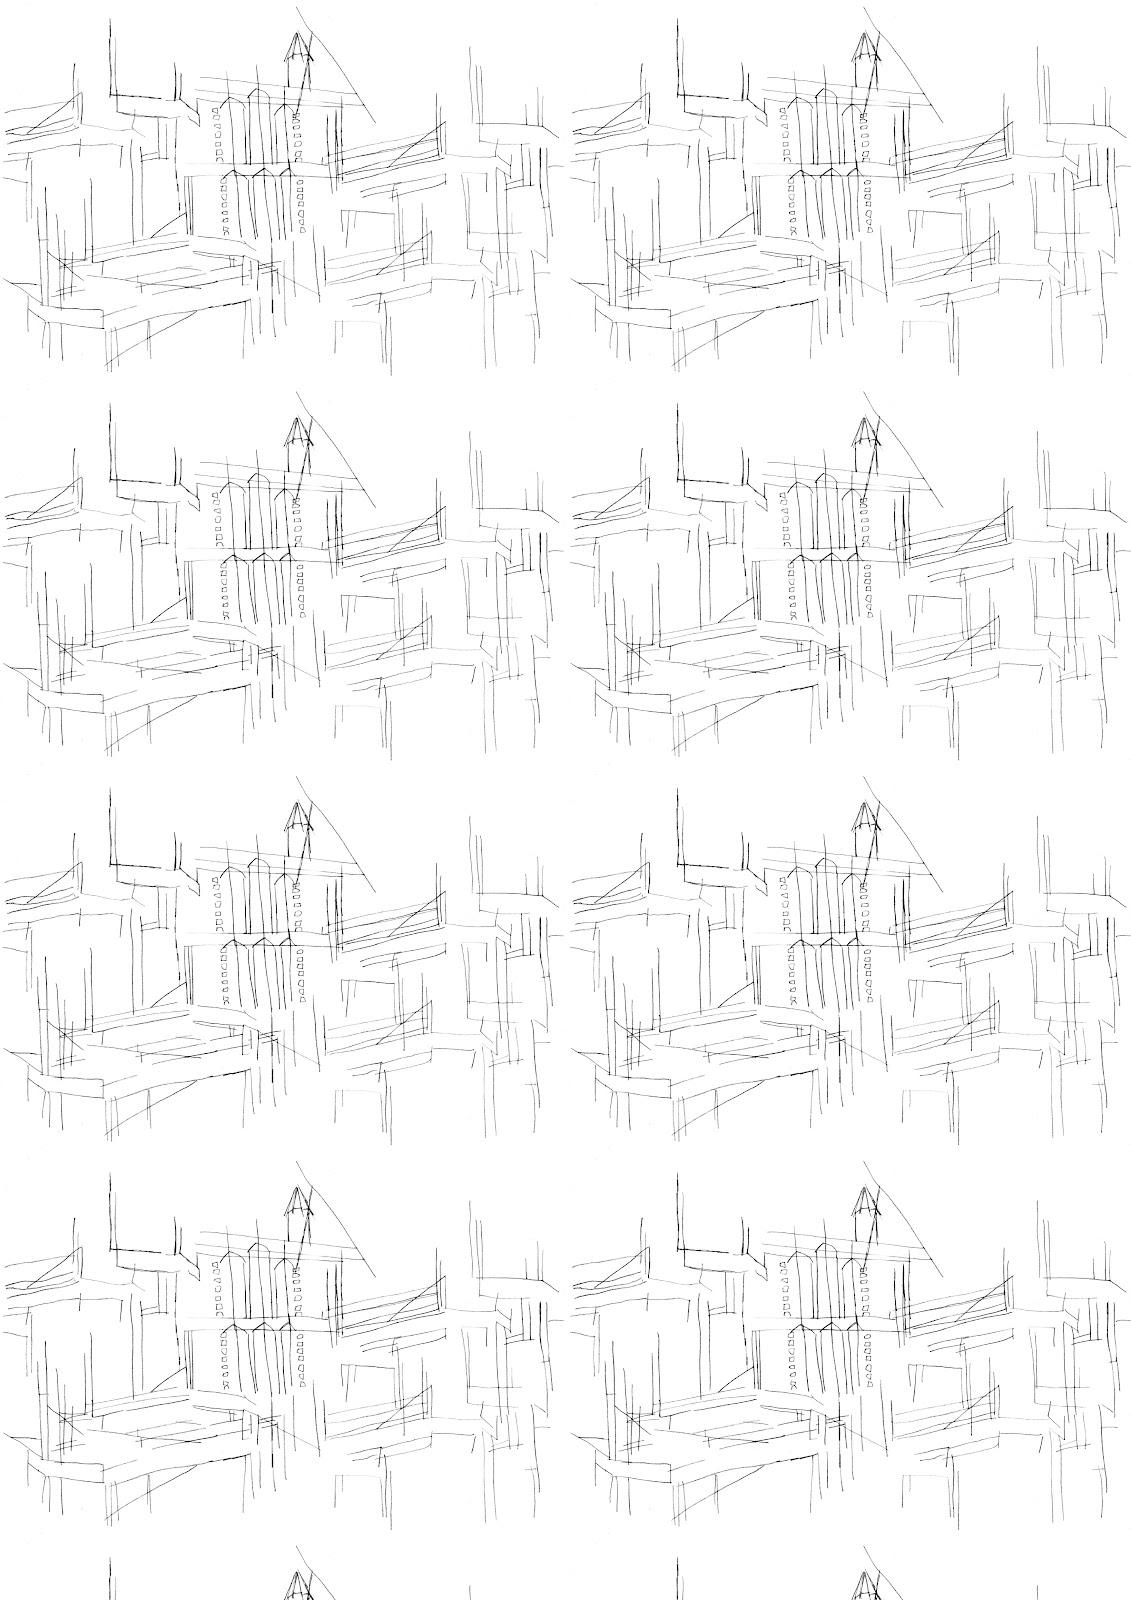 Zara Victoria Blog: wallpaper designs